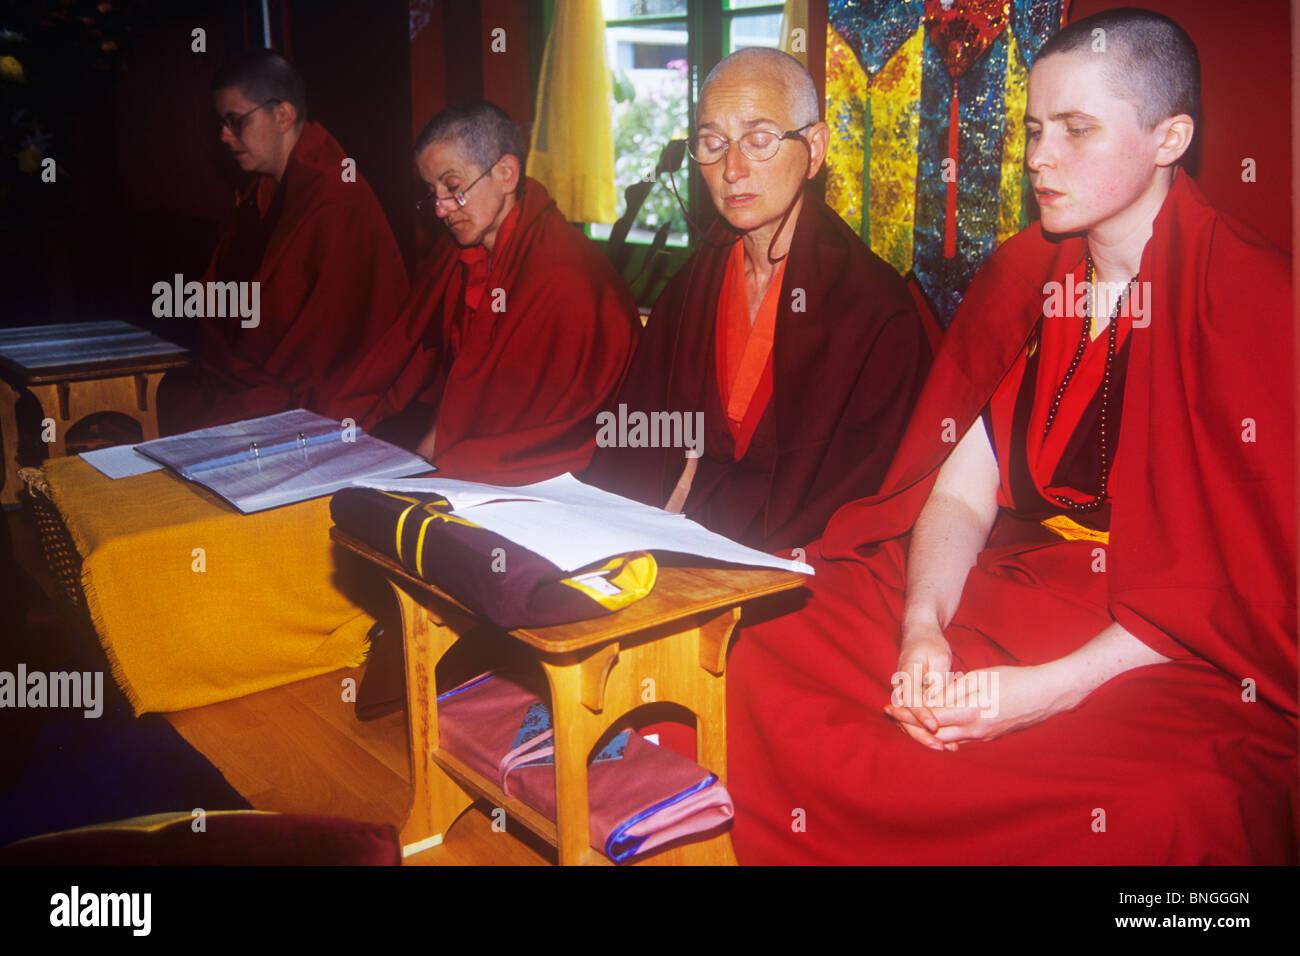 Western nuns worship in the Samye Dzong Tibtan Buddhist temple in South London - Stock Image